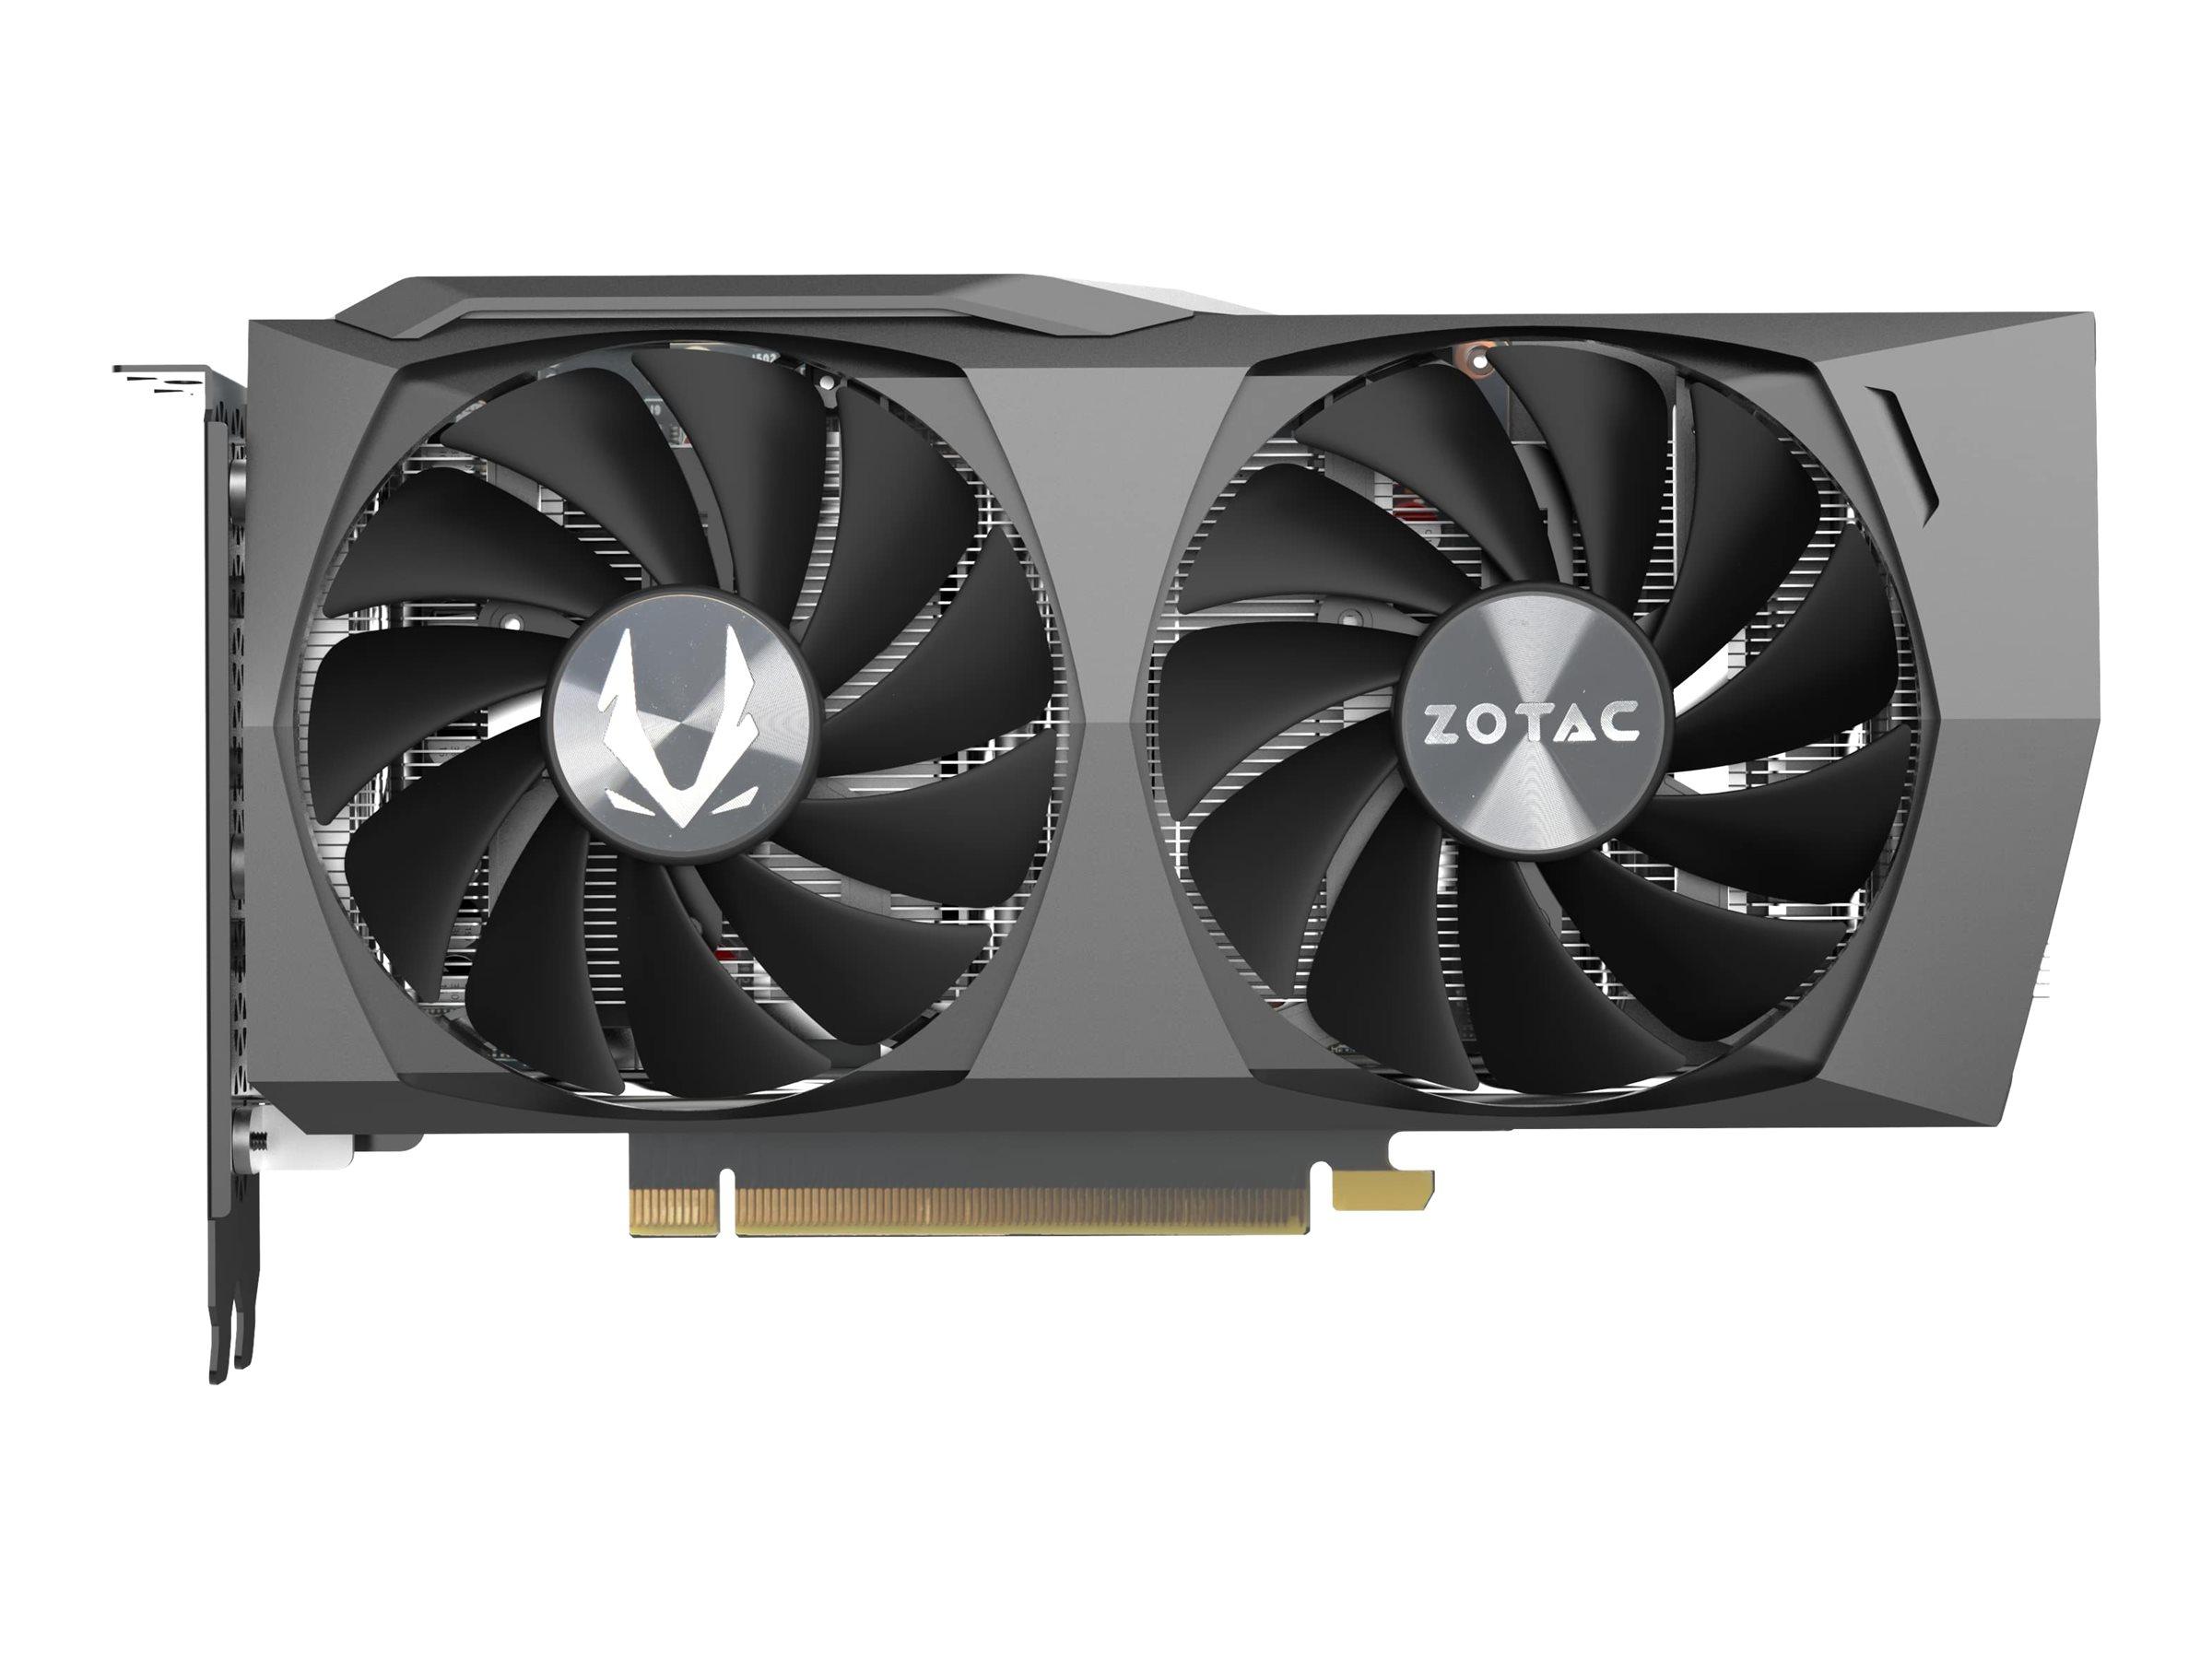 ZOTAC GAMING GeForce RTX 3060 Twin Edge - Grafikkarten